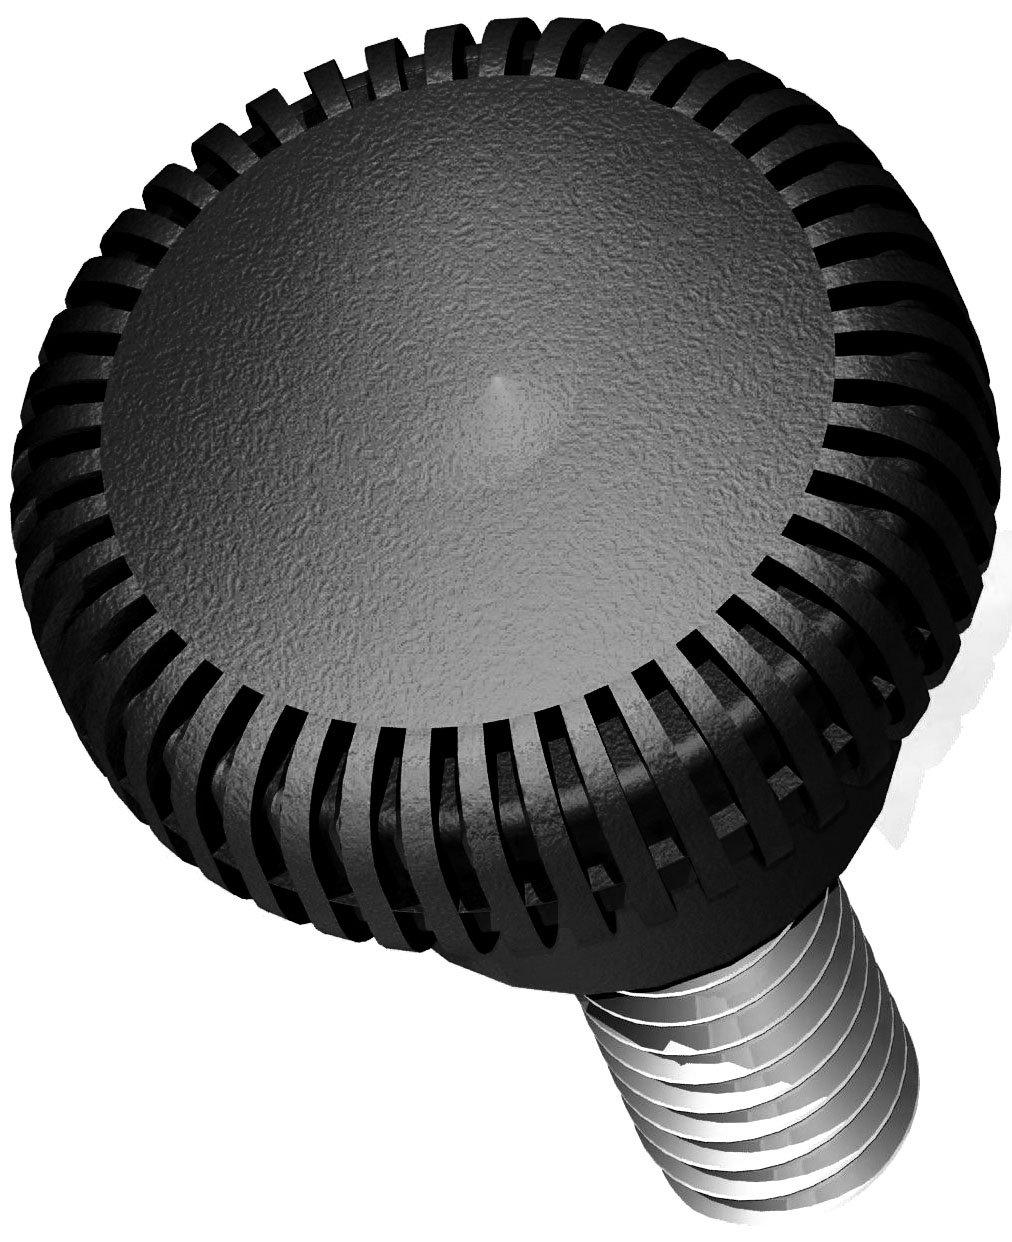 Innovative Components AN820500K3N21 .75'' Knurled knob blind 8-32 X .50'' steel zinc stud black ABS (Pack of 10)